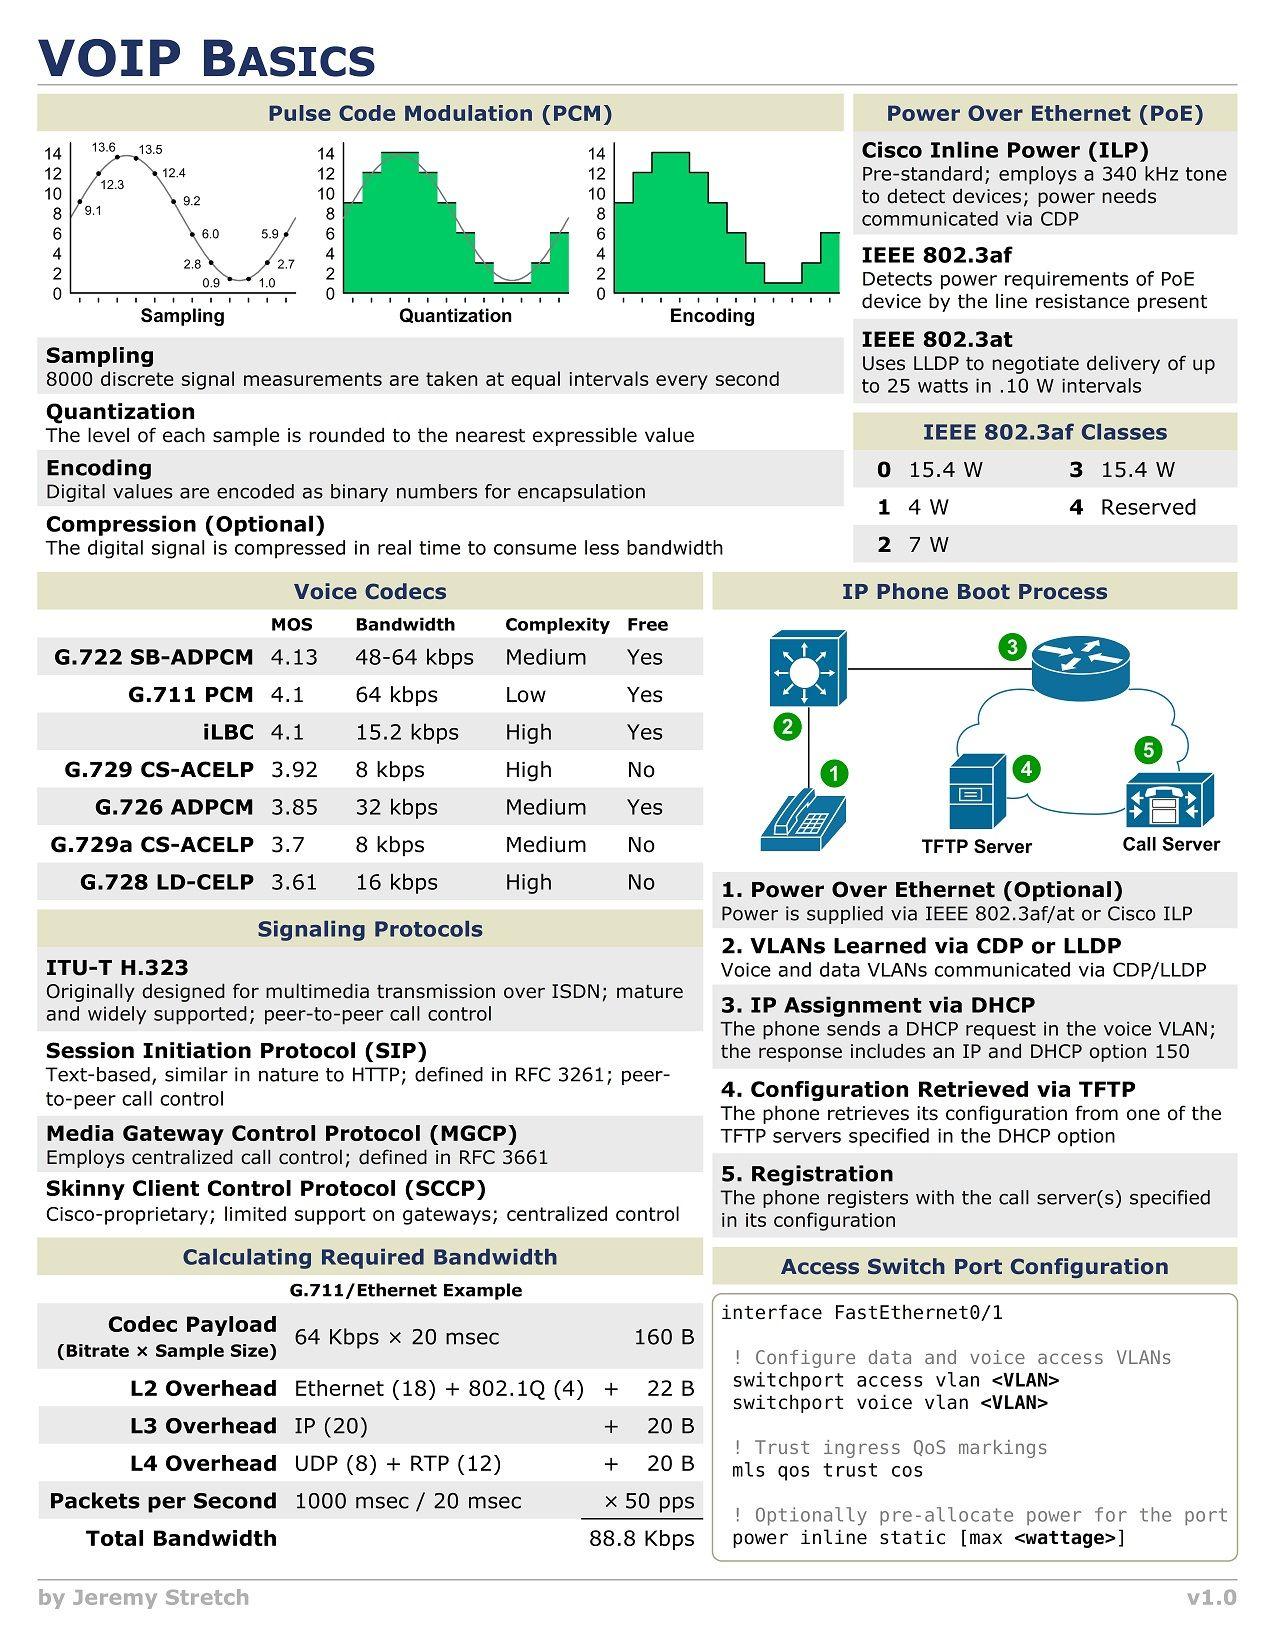 Phd dissertations online rutgers